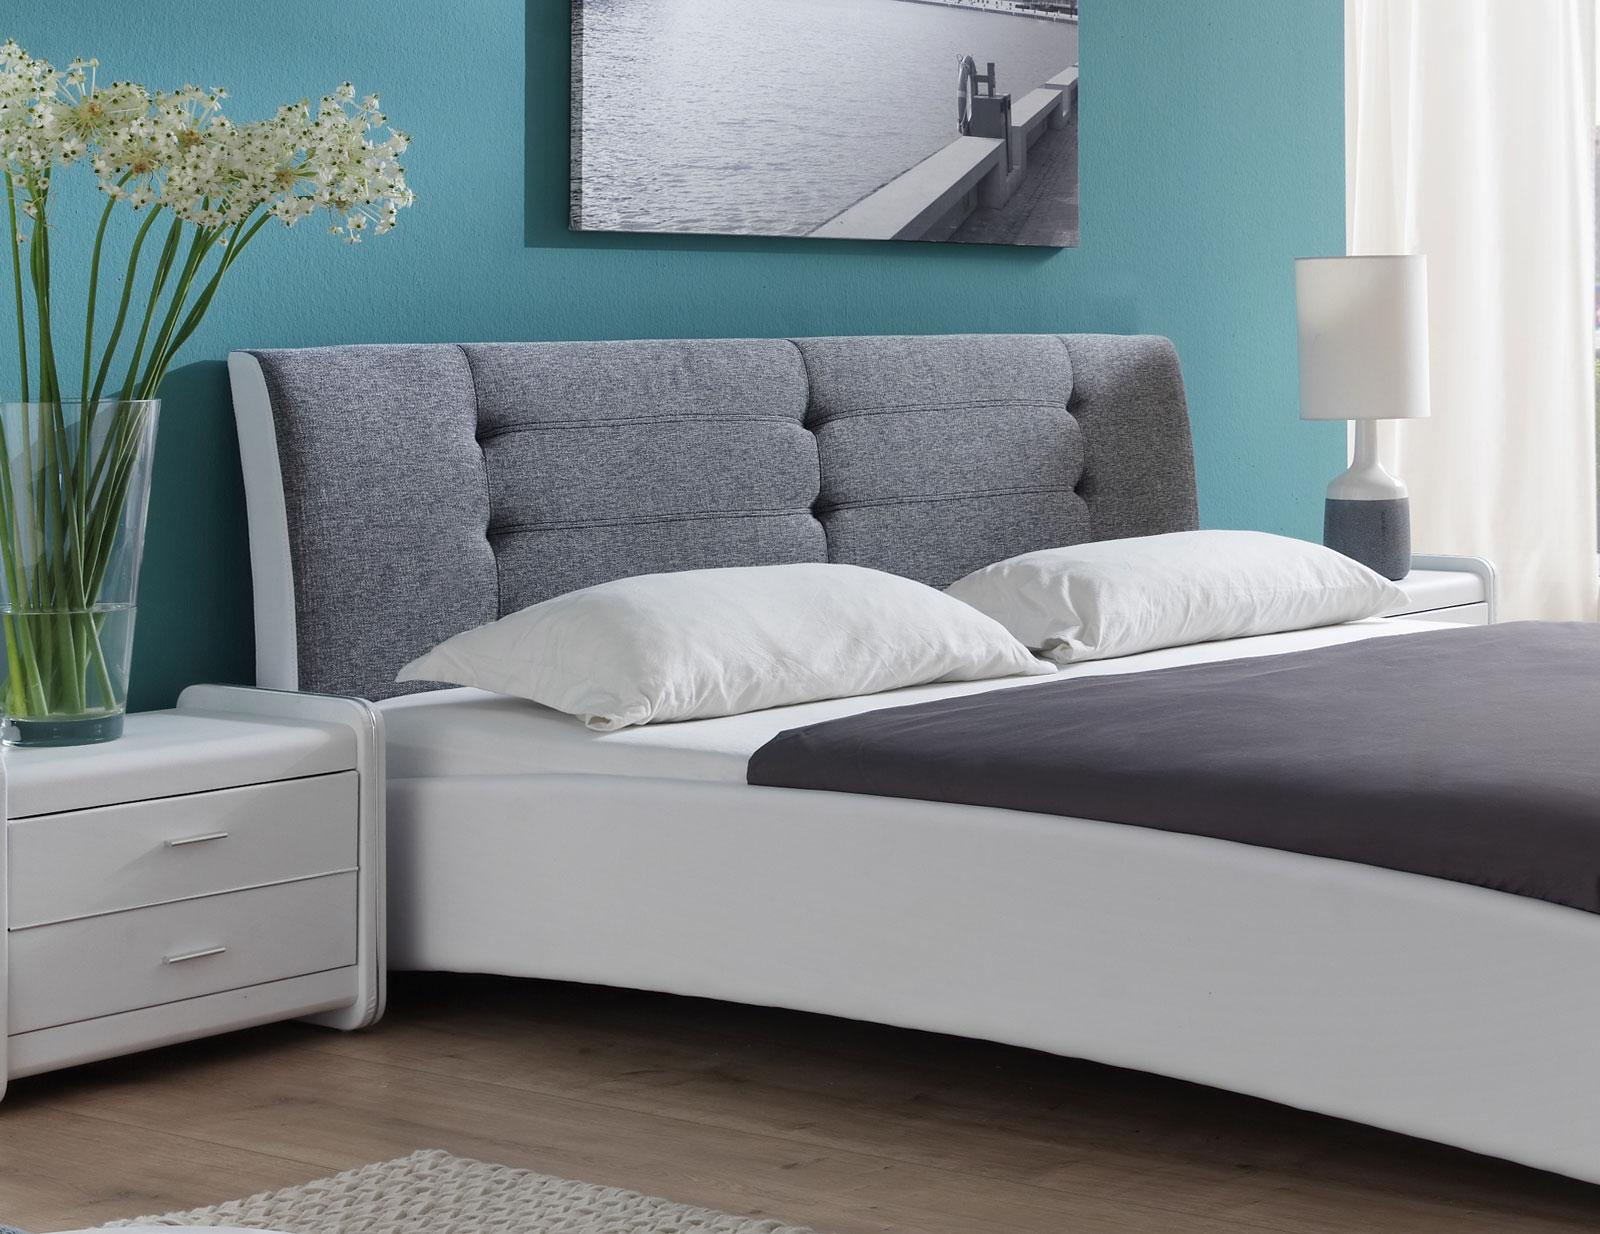 sam design polsterbett 160 x 200 cm wei grau bebop. Black Bedroom Furniture Sets. Home Design Ideas